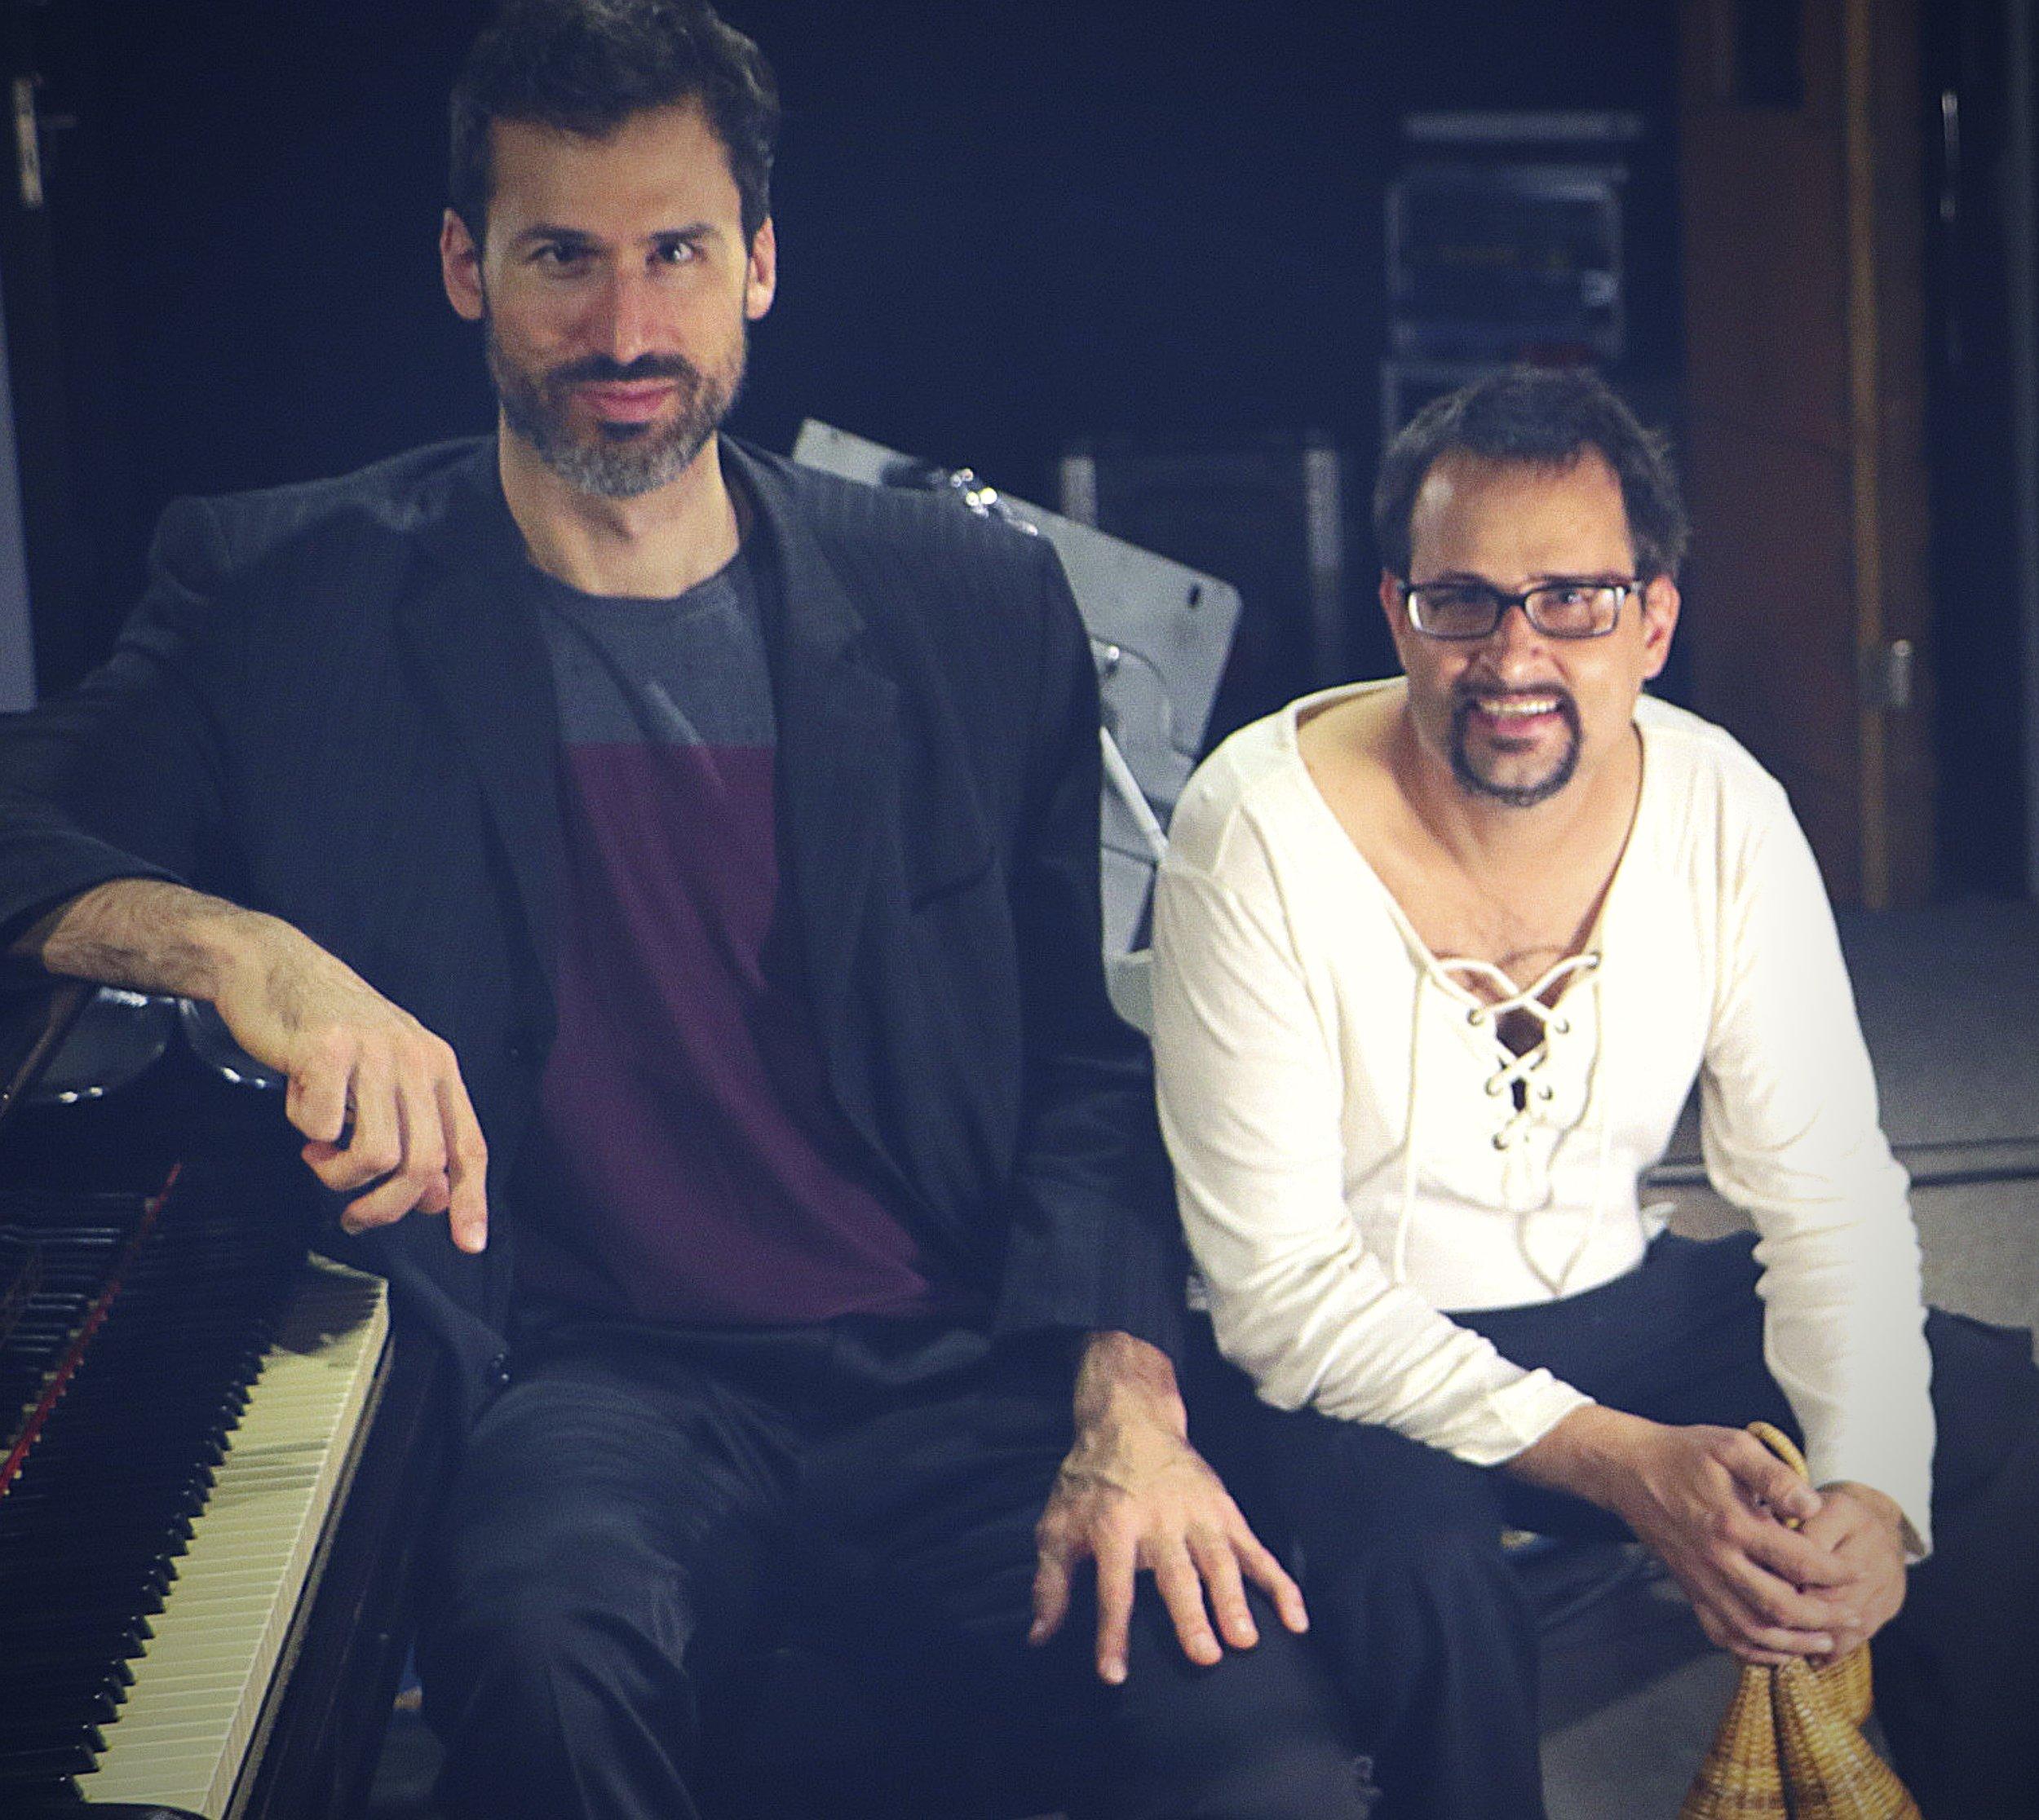 Ideograma - Daniel Grajew e Emilio Martins (Lucas Scandura).jpg